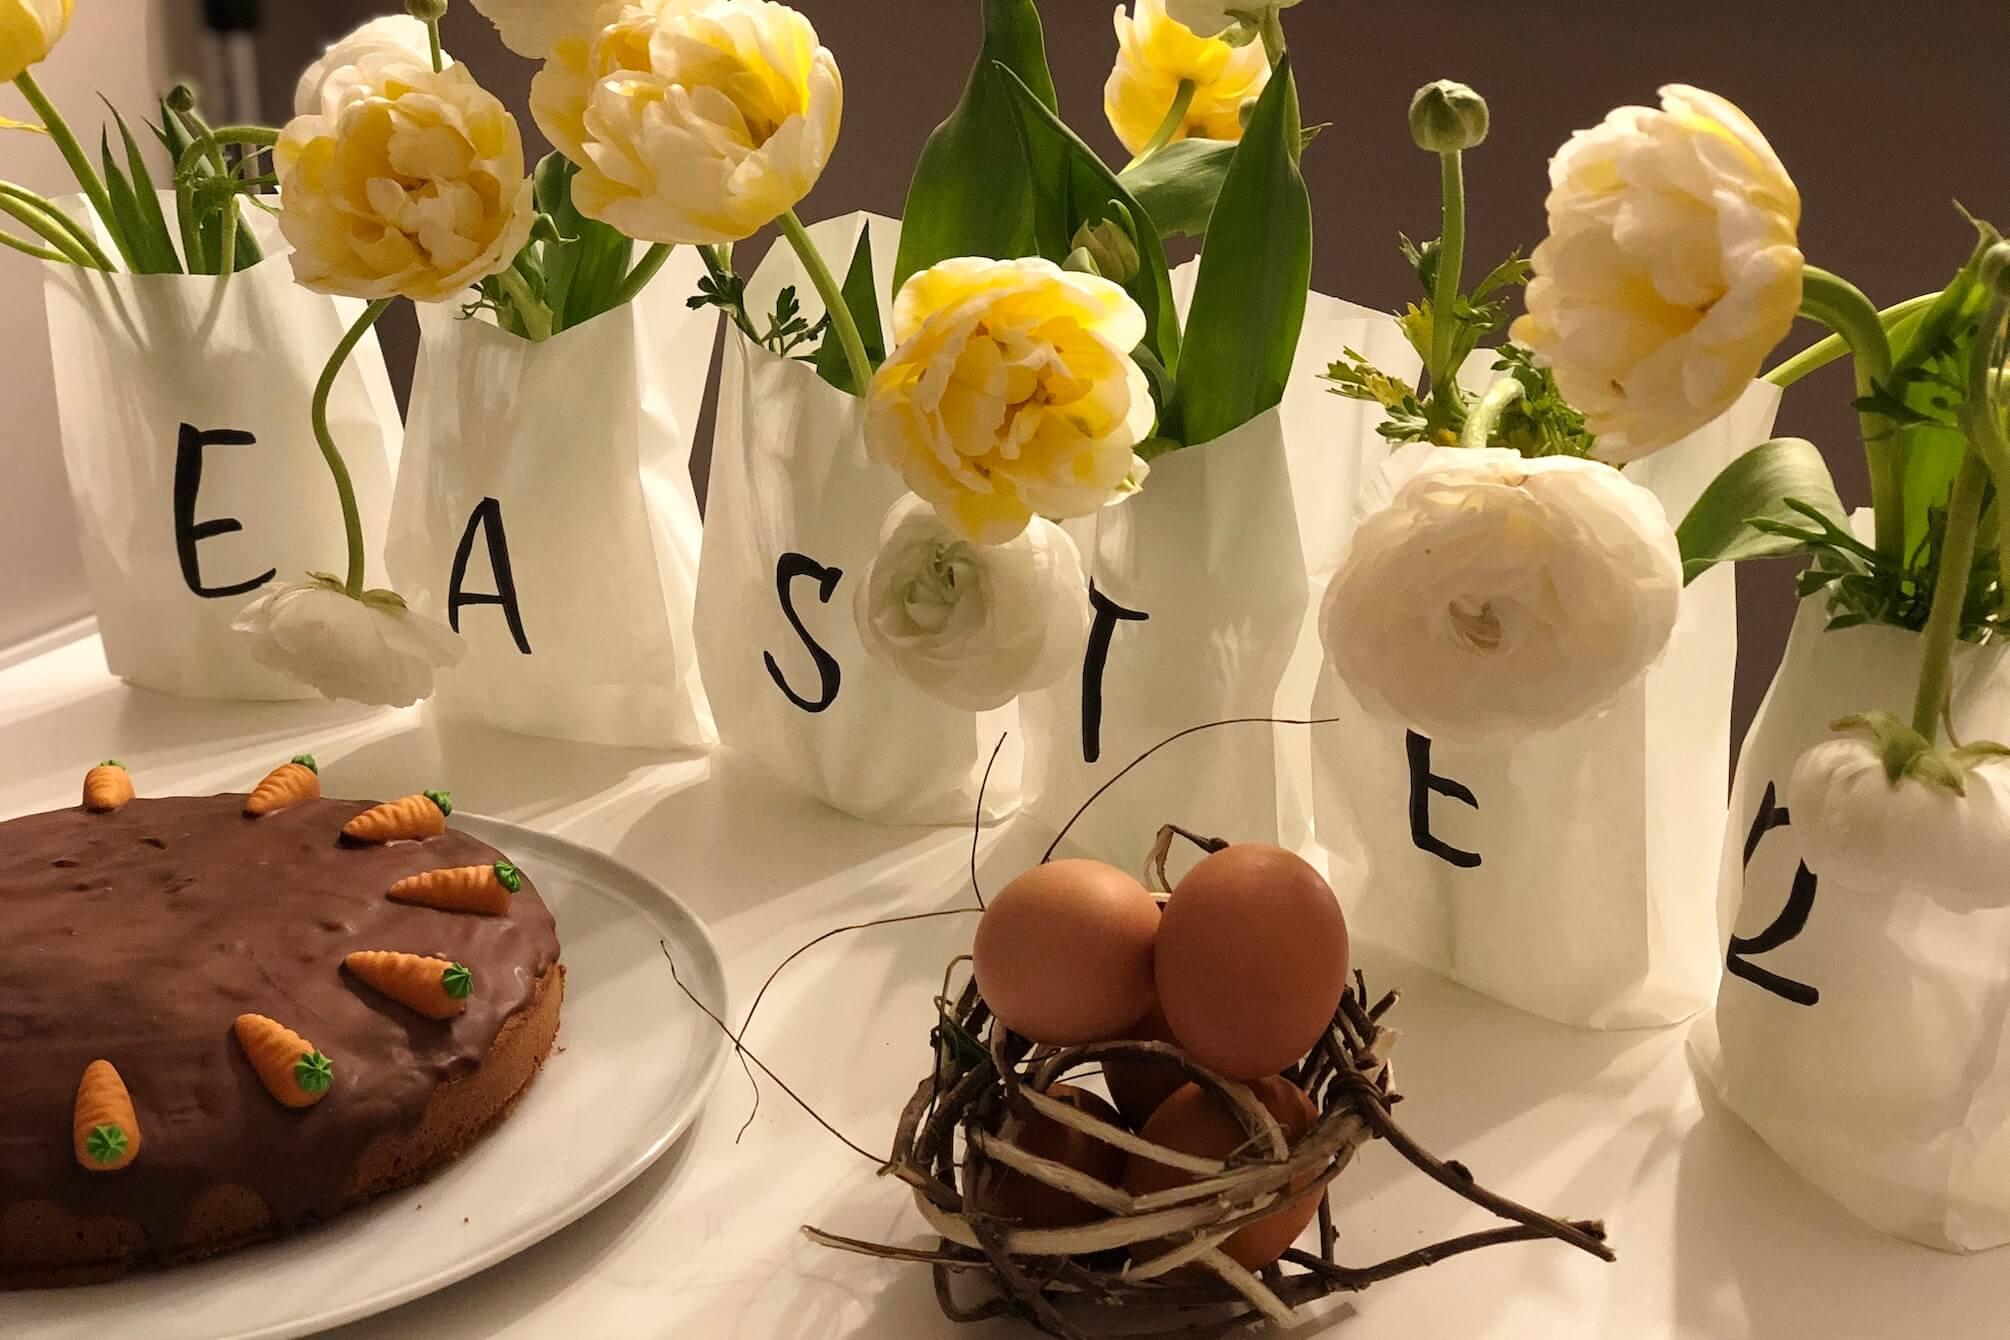 Ostern war unser zweites Weihnachten - www.expatmamas.de/blog/ #expatmamas #imauslandzuhause #ostern